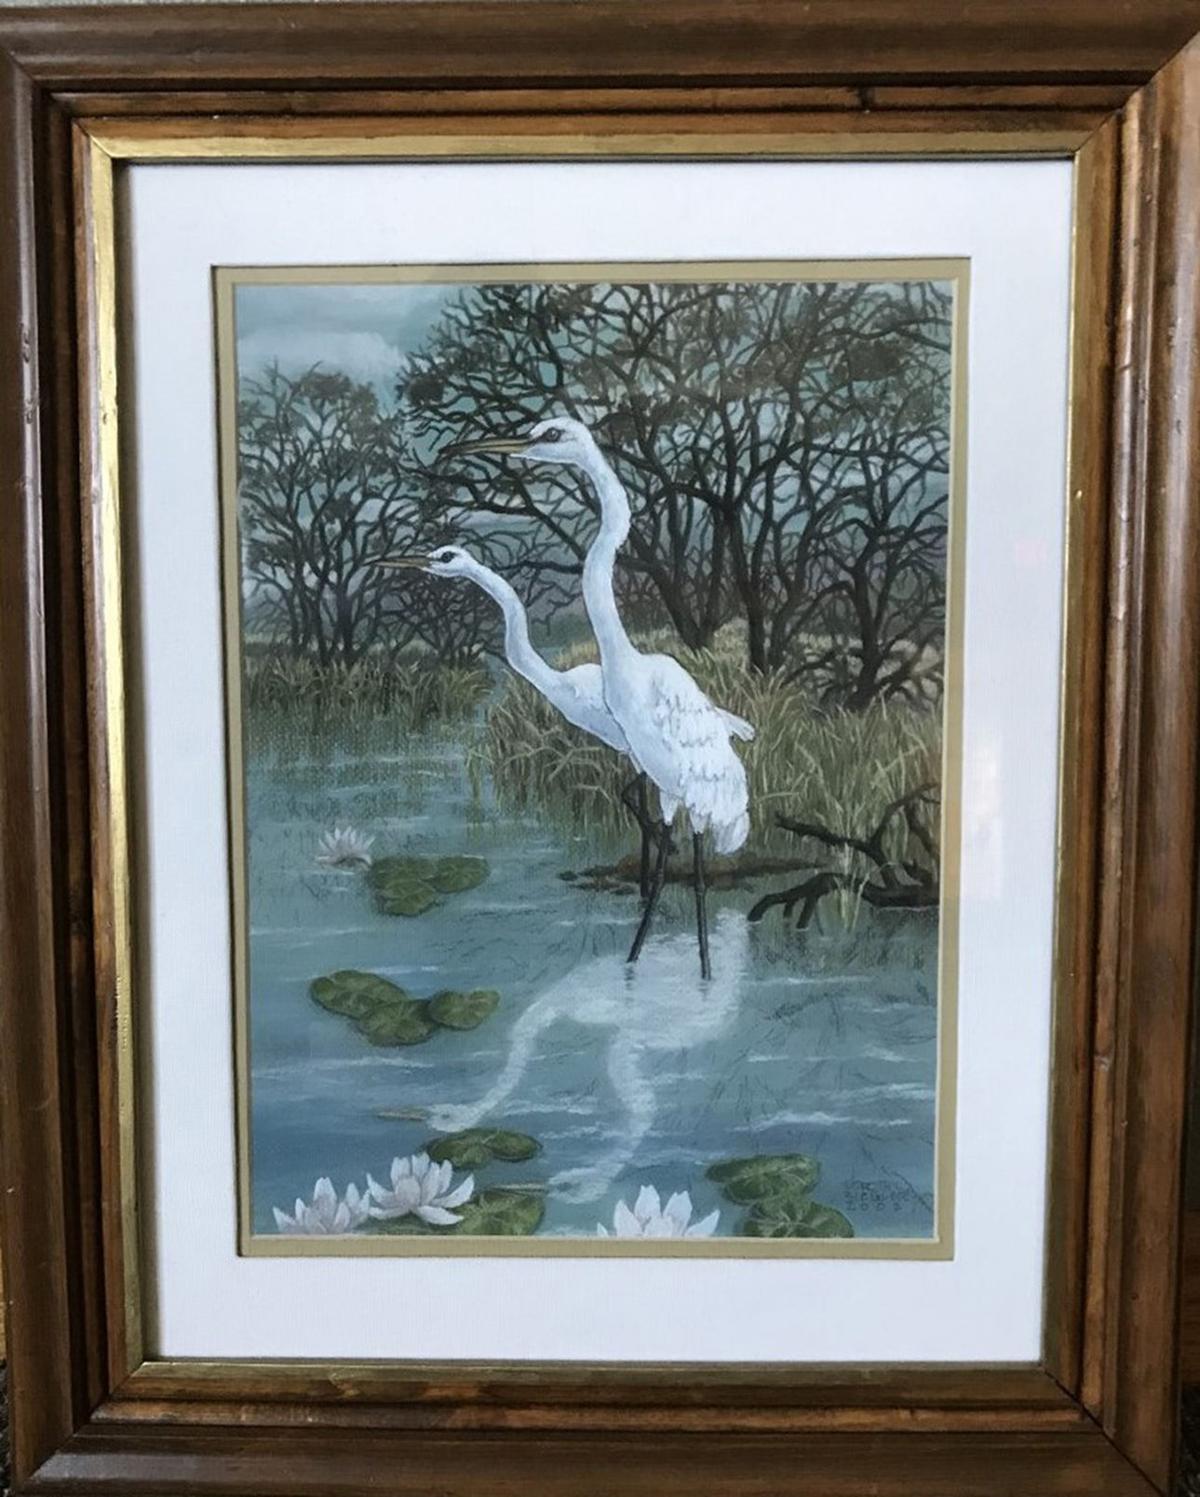 'Egrets,' by Dorothy Ziegler